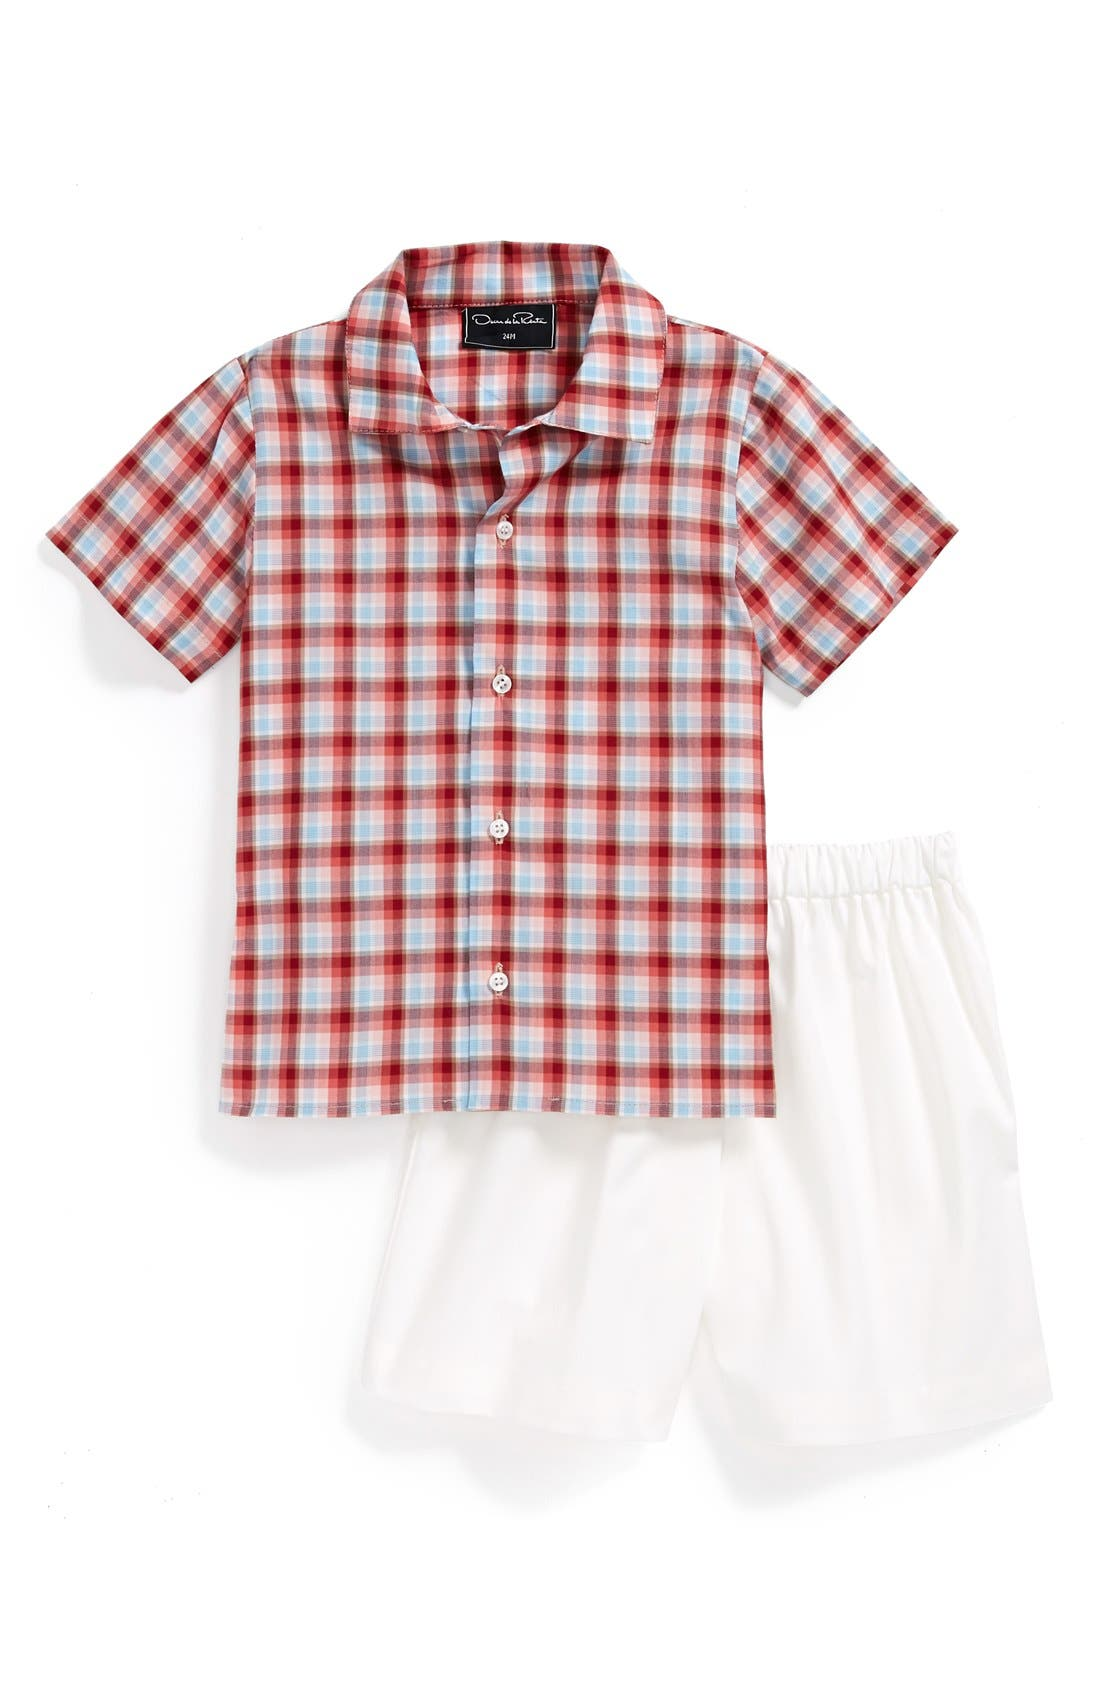 Alternate Image 1 Selected - Oscar de la Renta Woven Shirt and Shorts (Baby Boys)